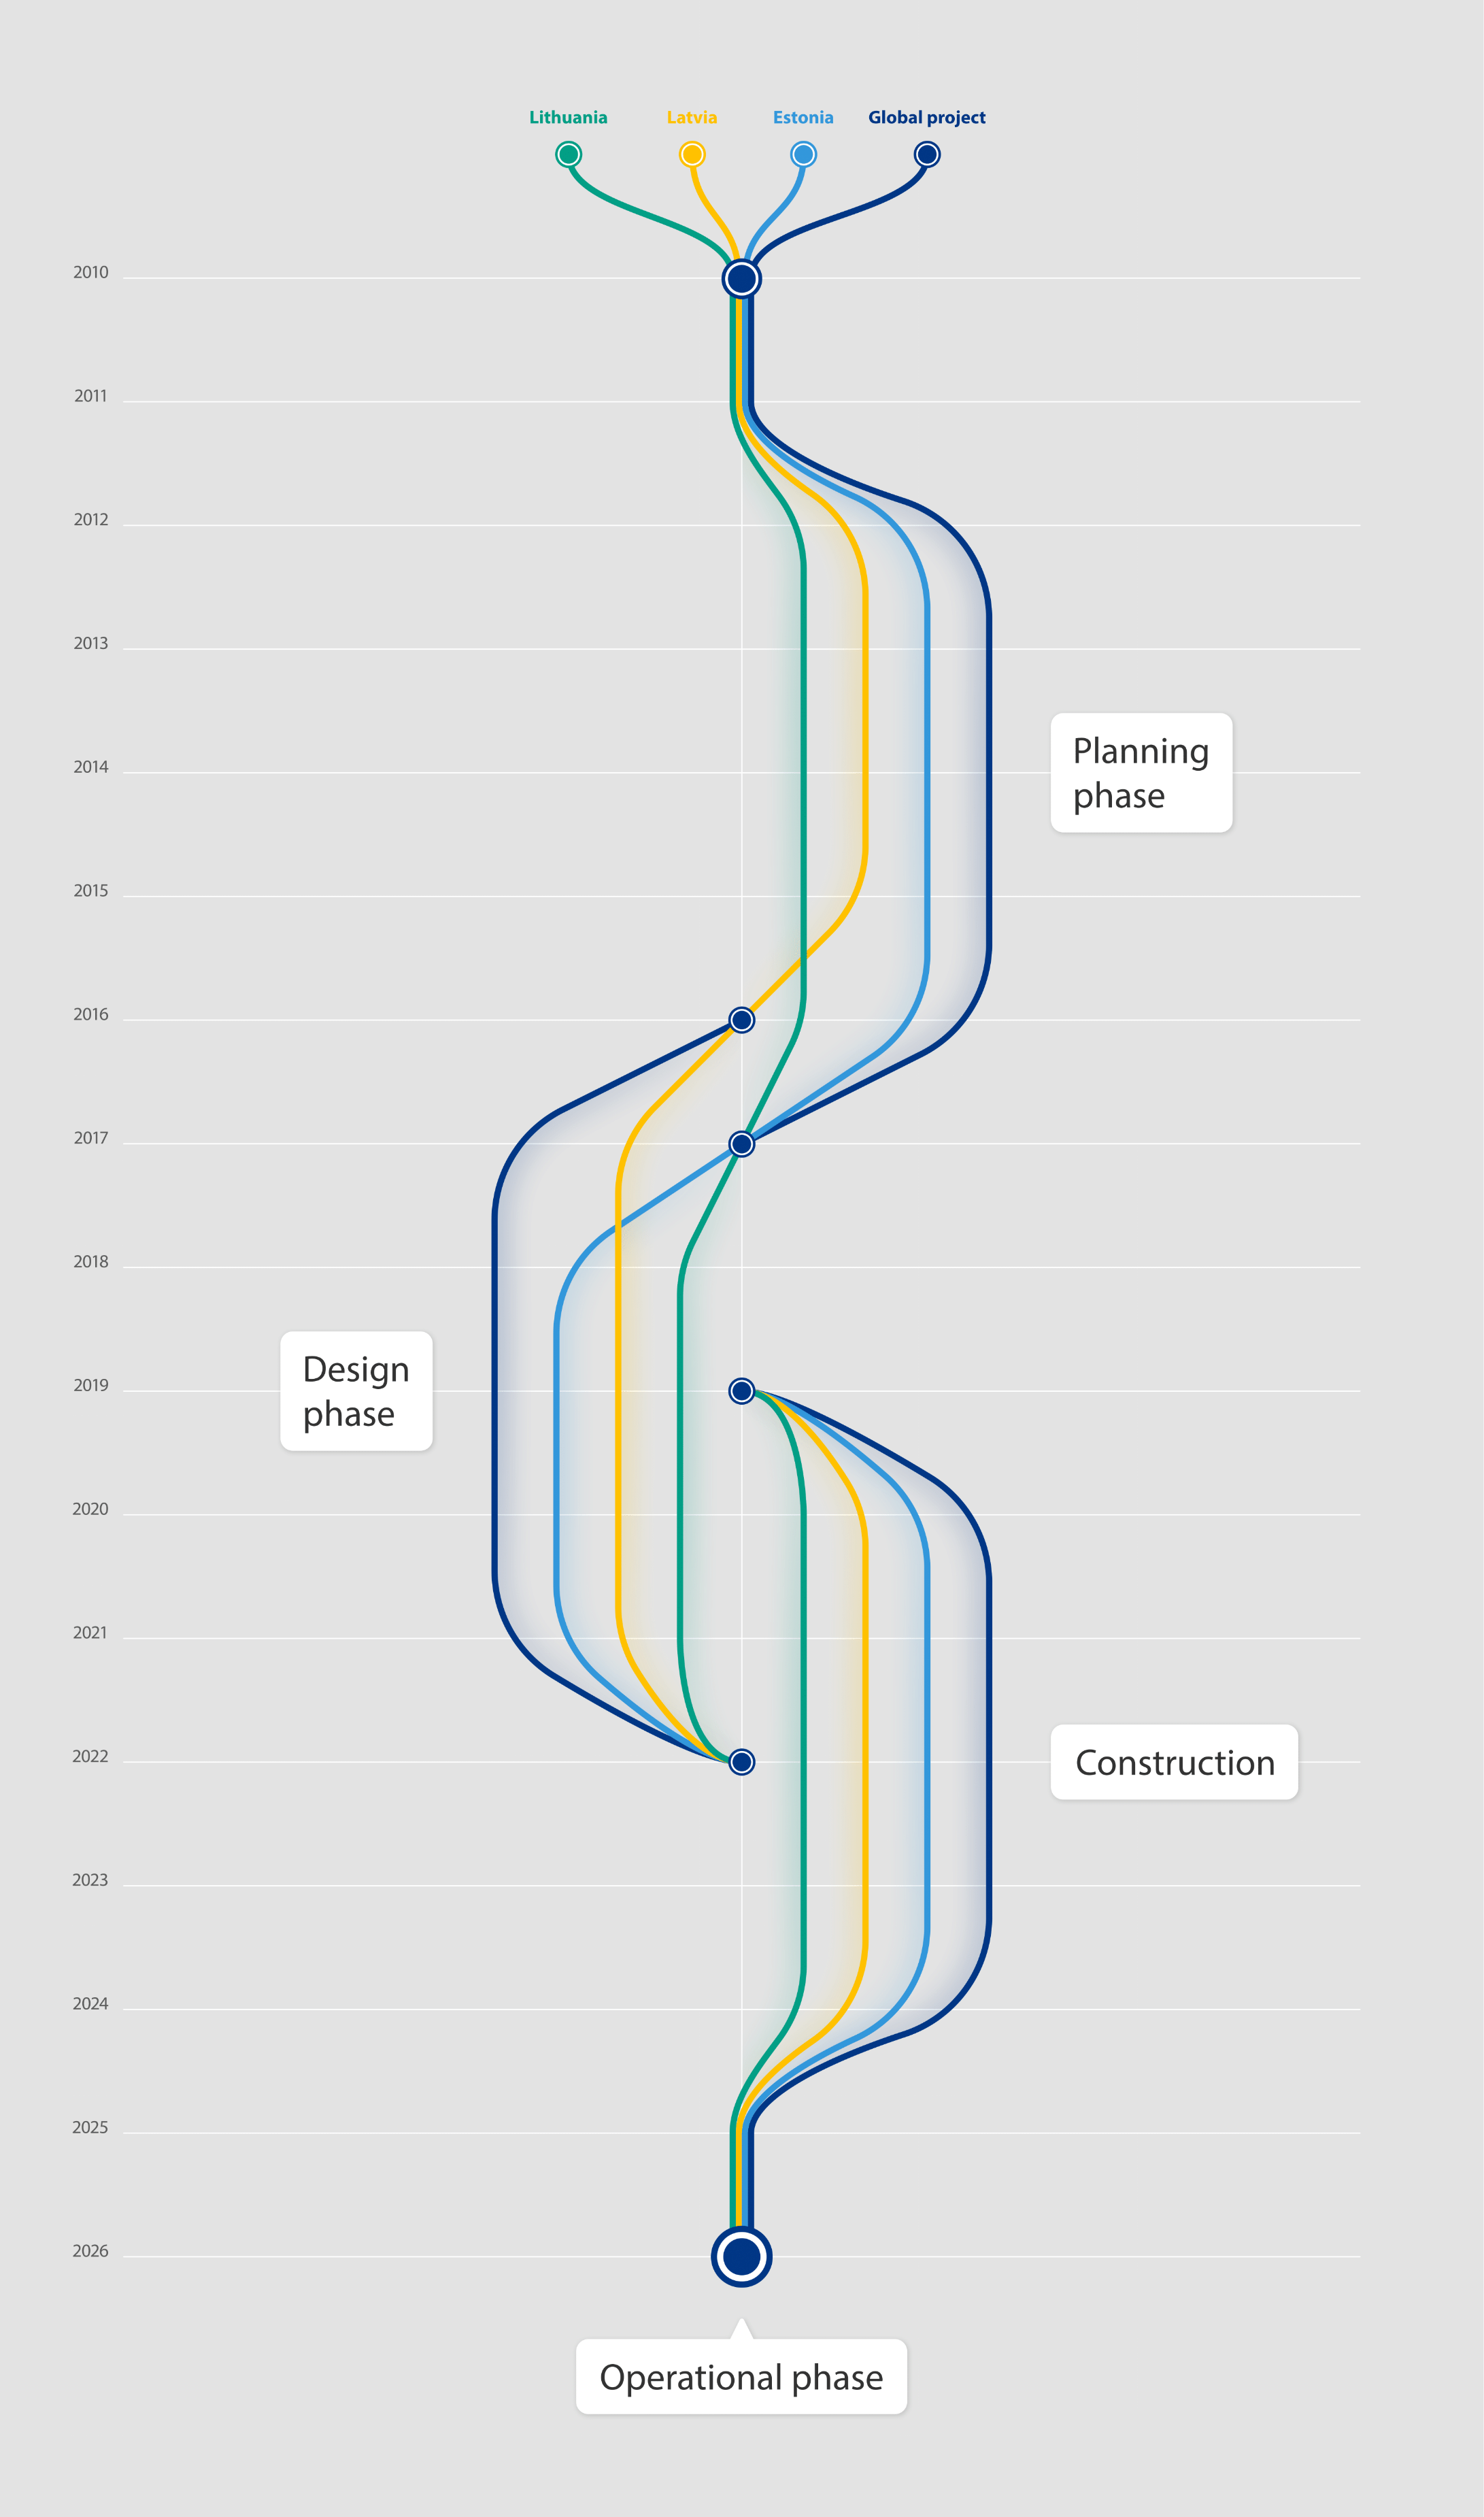 Rail Baltica Project Timeline